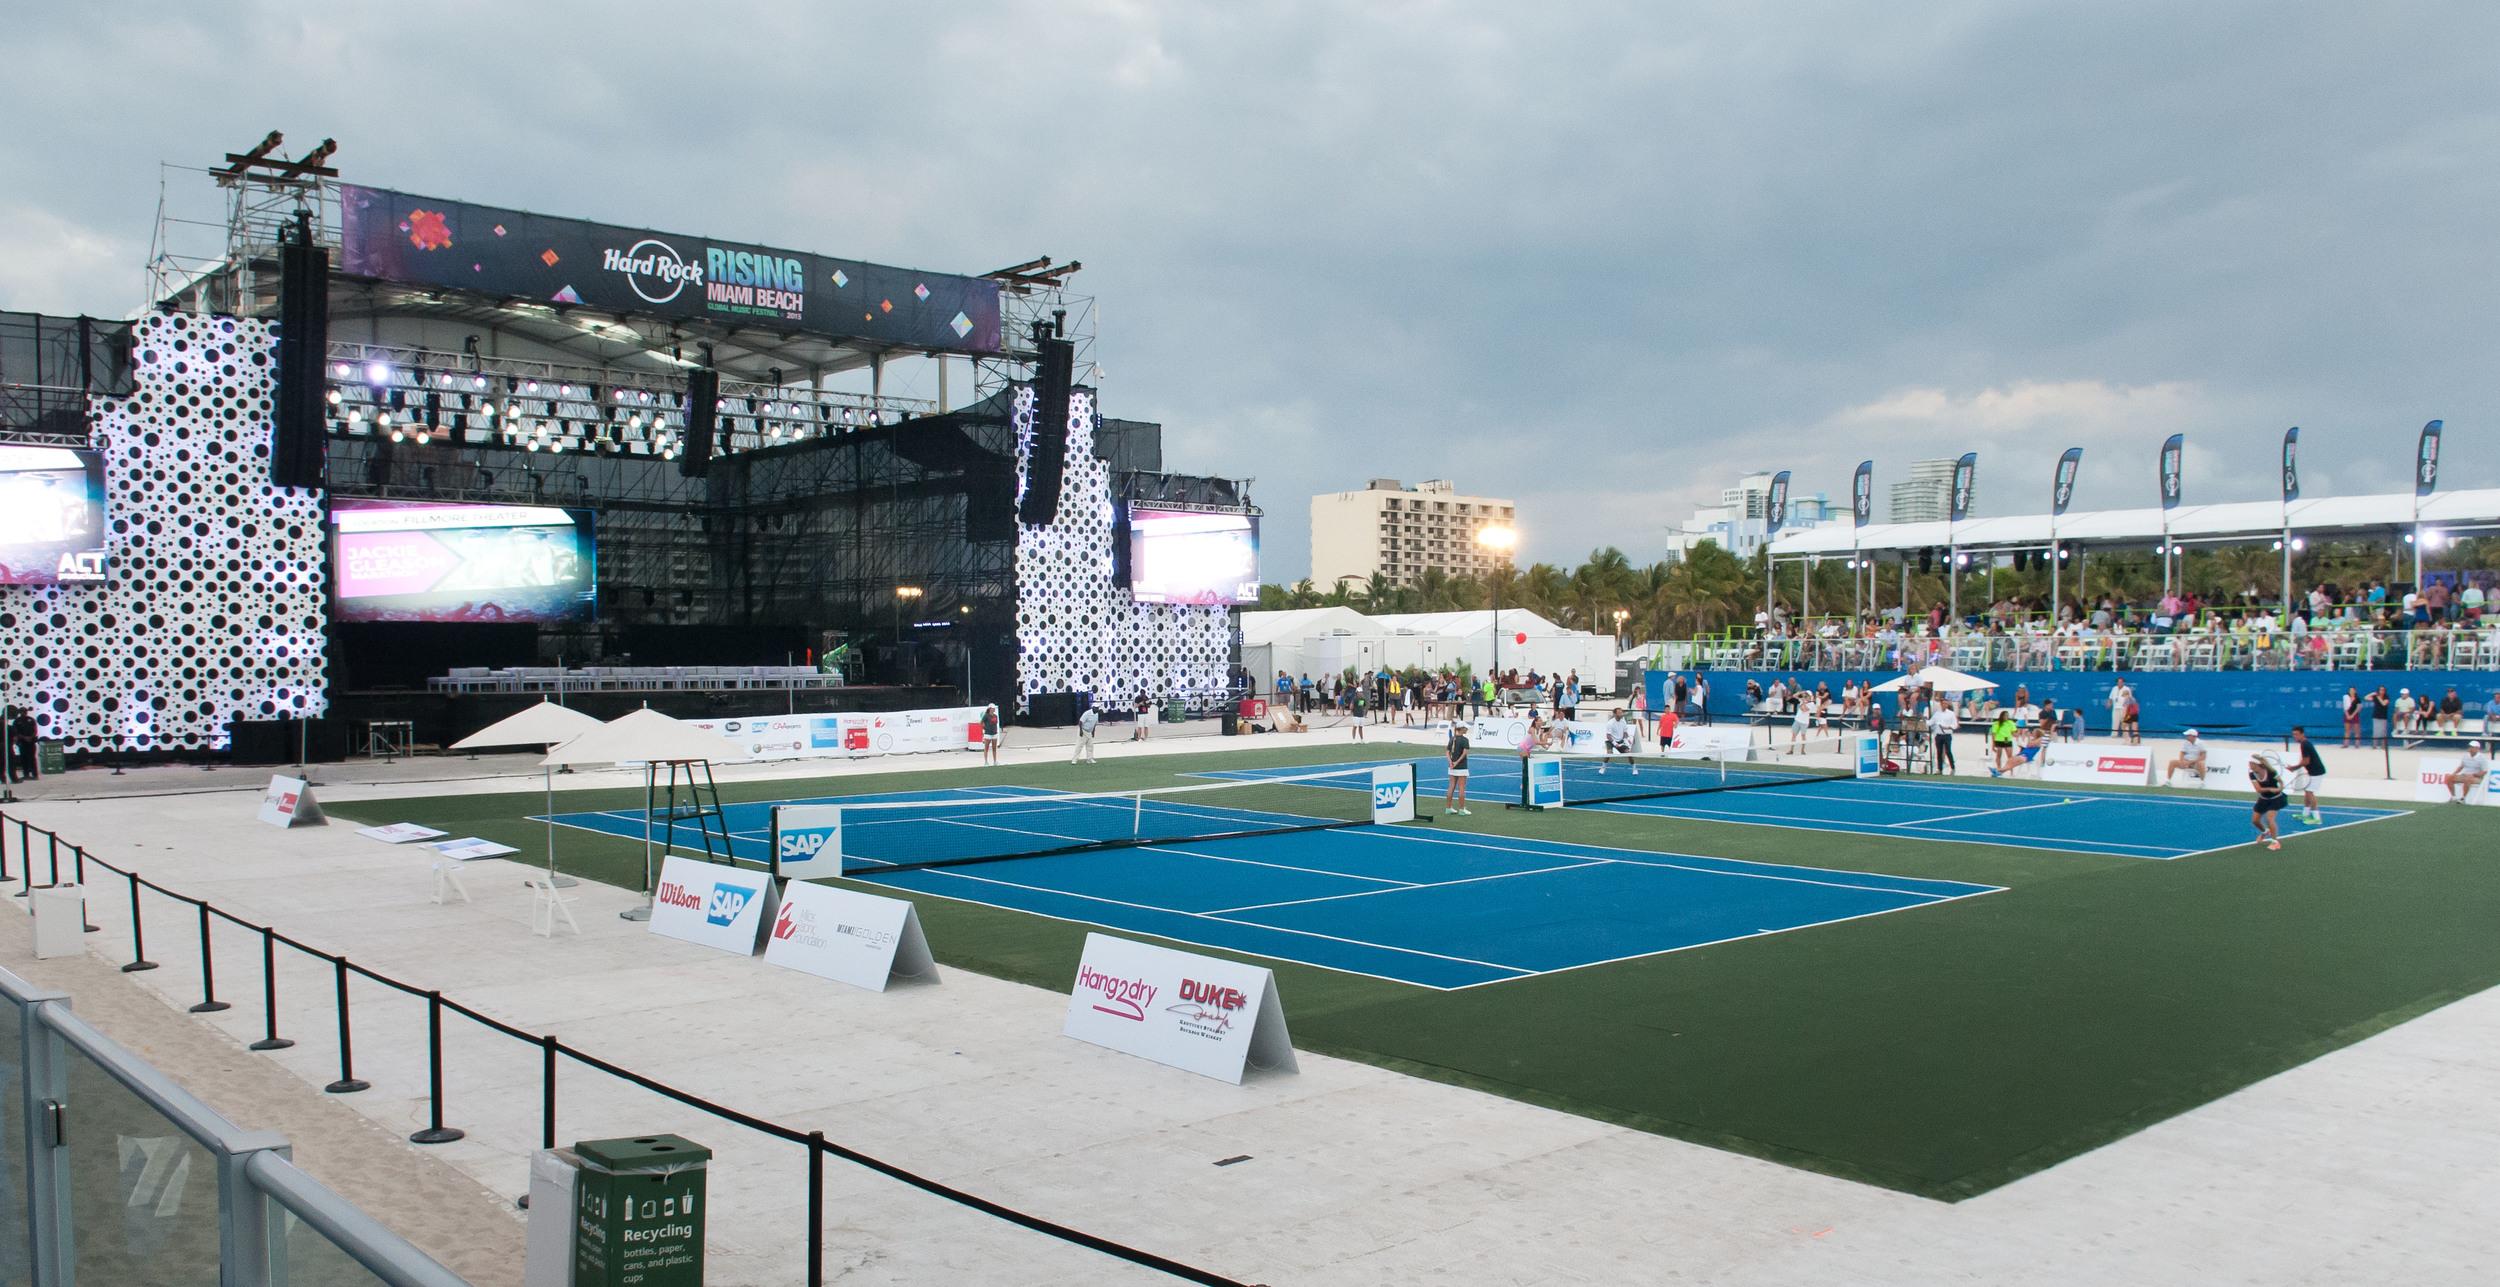 21319-MB100-MiamiBeach-TennisProExhibition .jpg